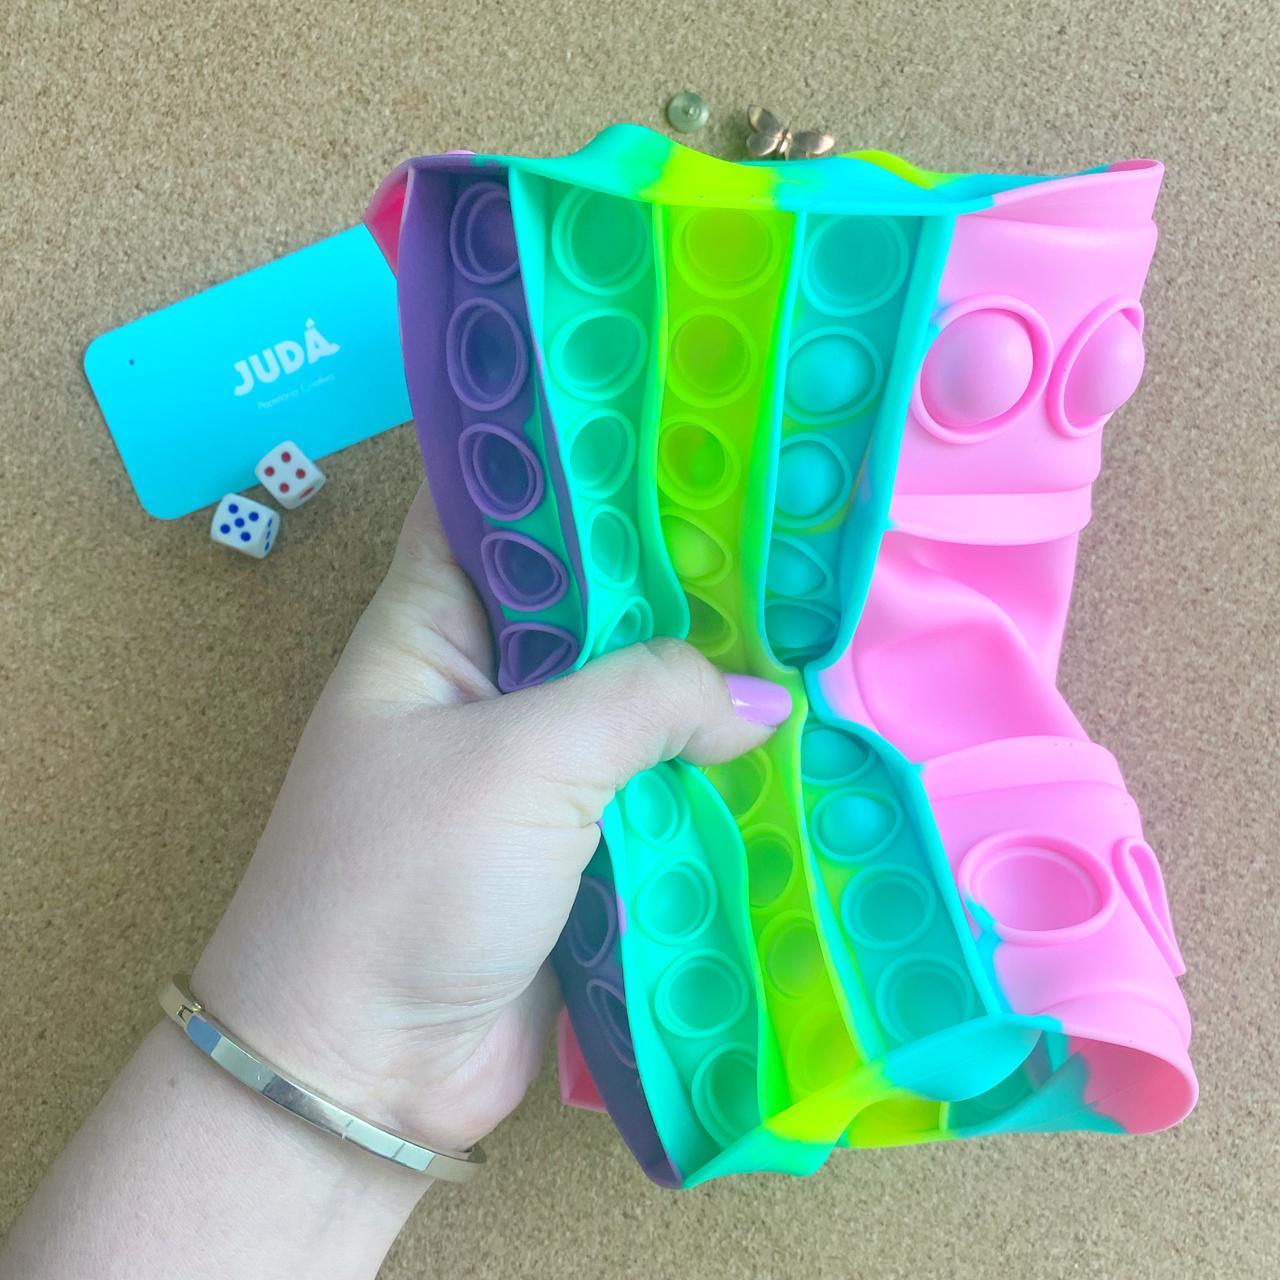 Jogo Dado Pop Popit de Silicone Fidget Toy Brinquedo Anti stress Relaxante Cor Tom Pastel| Importado